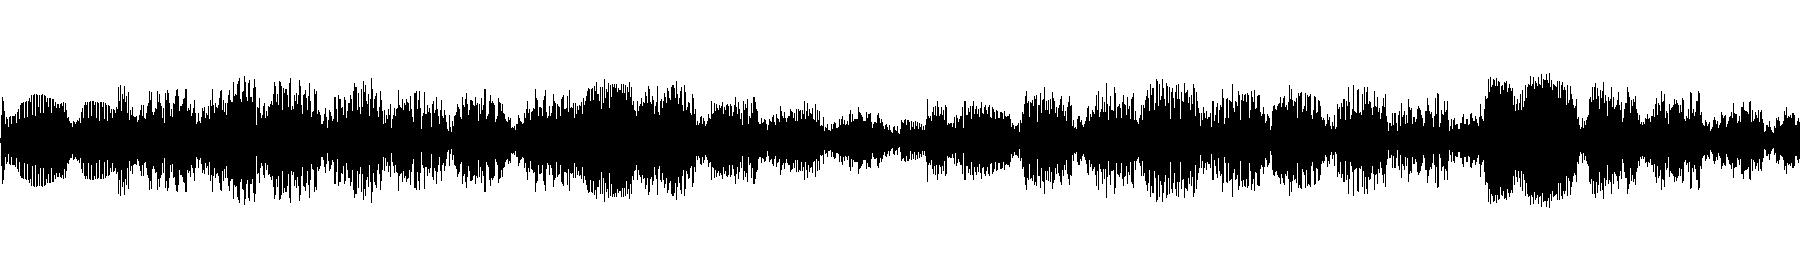 blbc dustygretsch 110 c